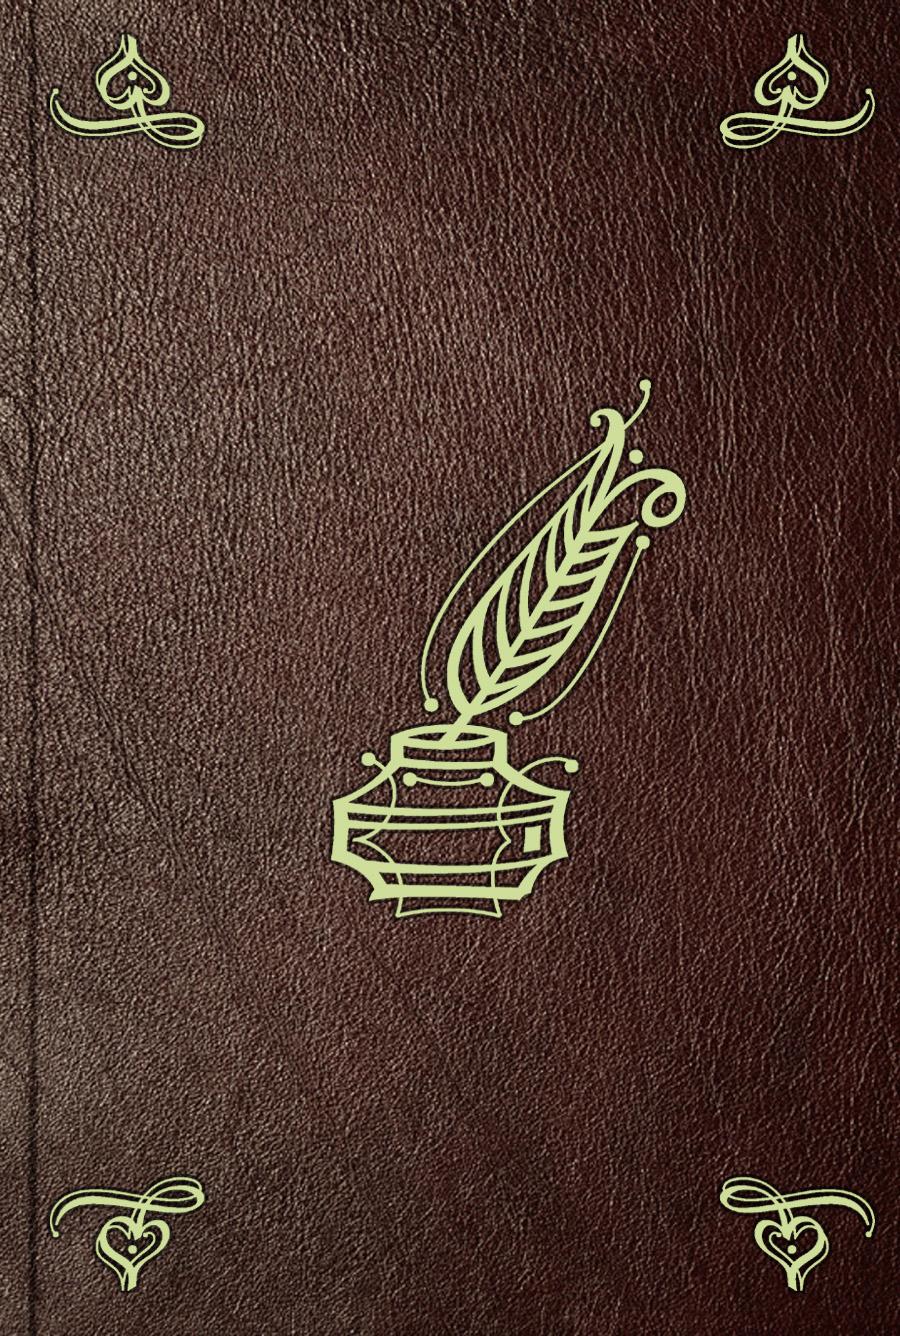 Сэмюэл Ричардсон Clarisse Harlowe T. 1 nouvelle traduction de roland l amoureux de matheo maria boyardo volume 1 french edition